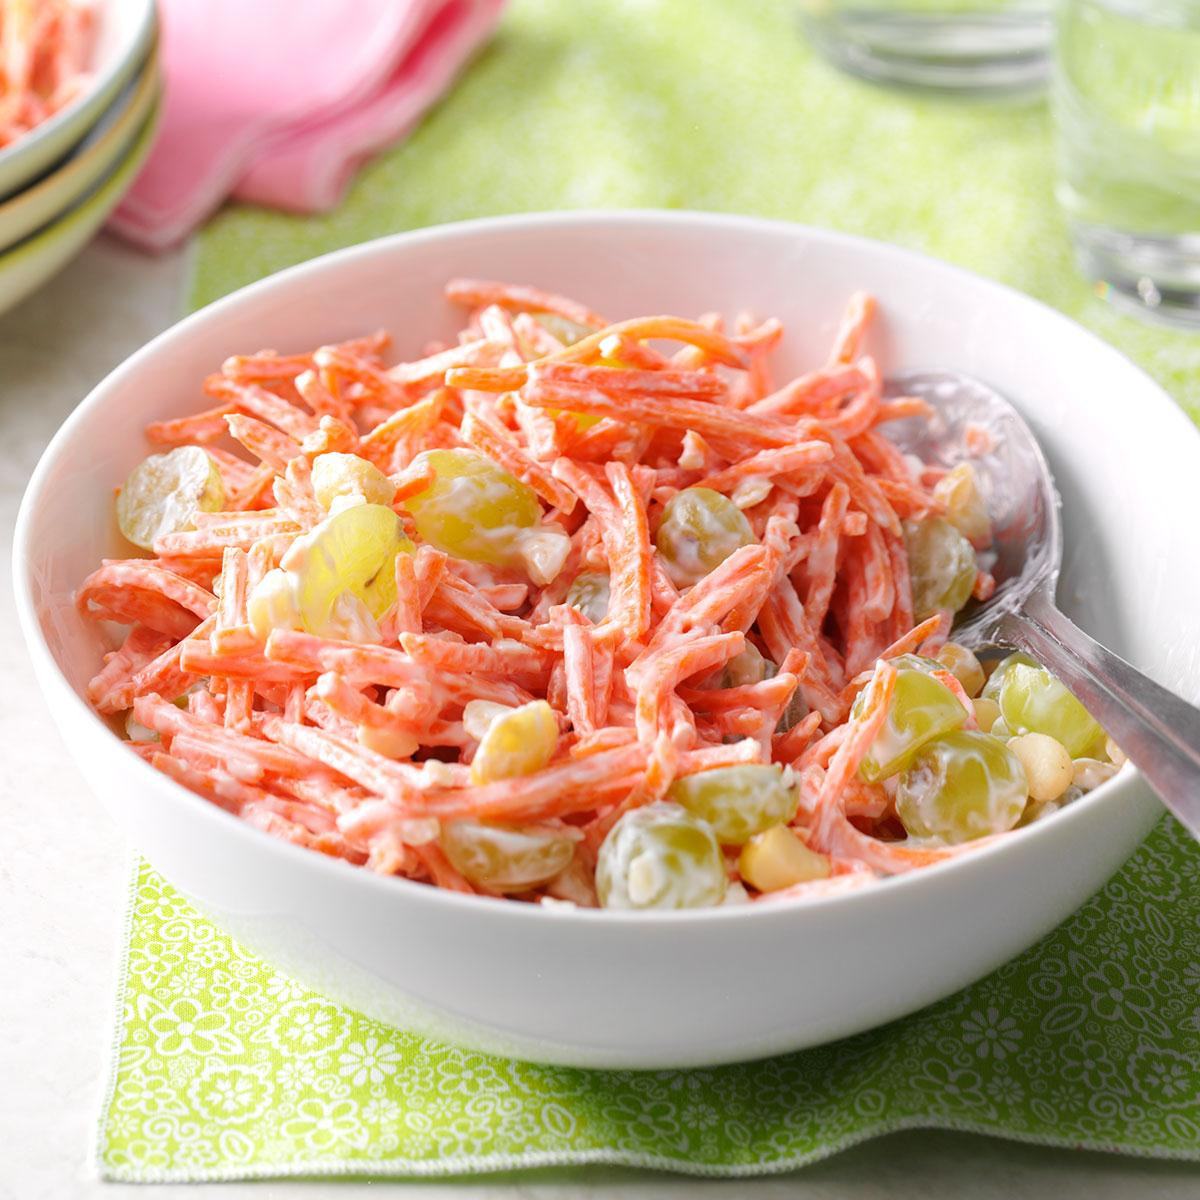 Carrot Salad Recipes  Pina Colada Carrot Salad Recipe